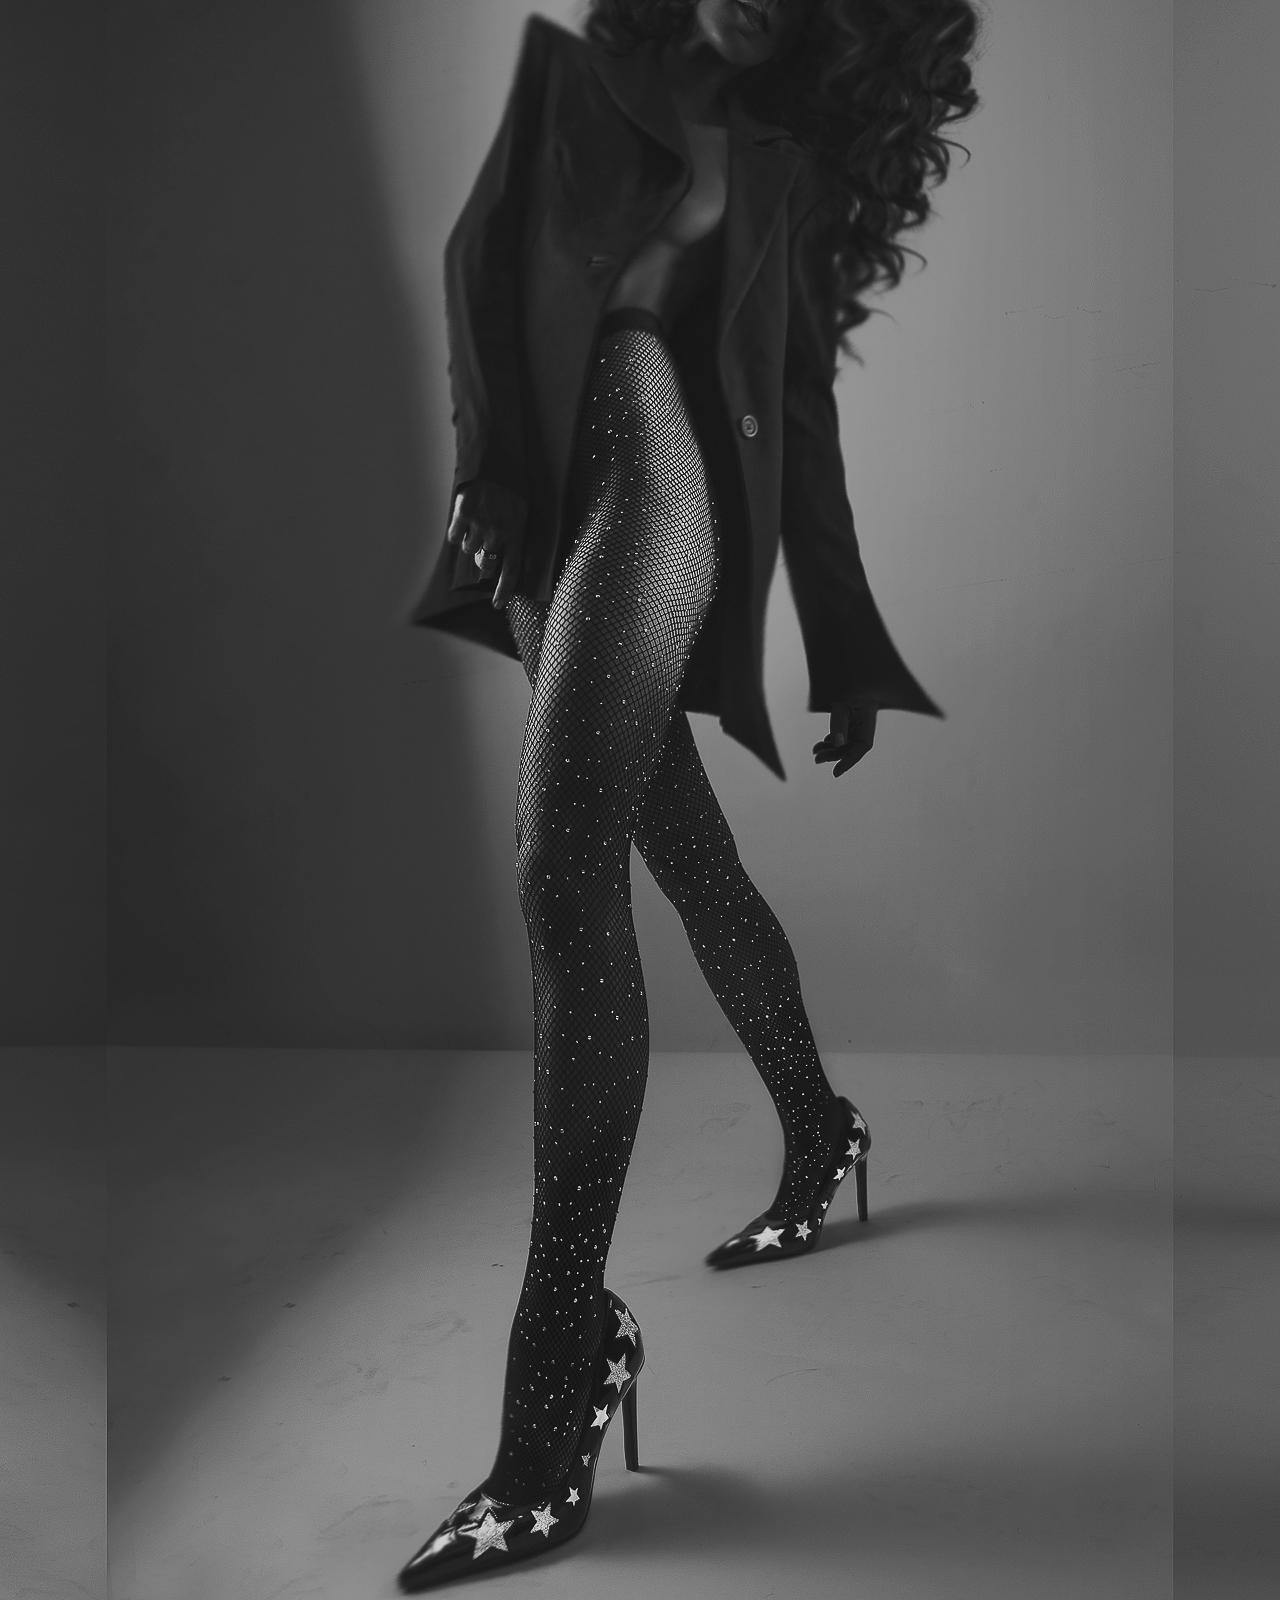 Julia Liubenova-bodyportrait-5086-ME-OilPainted-2.jpg